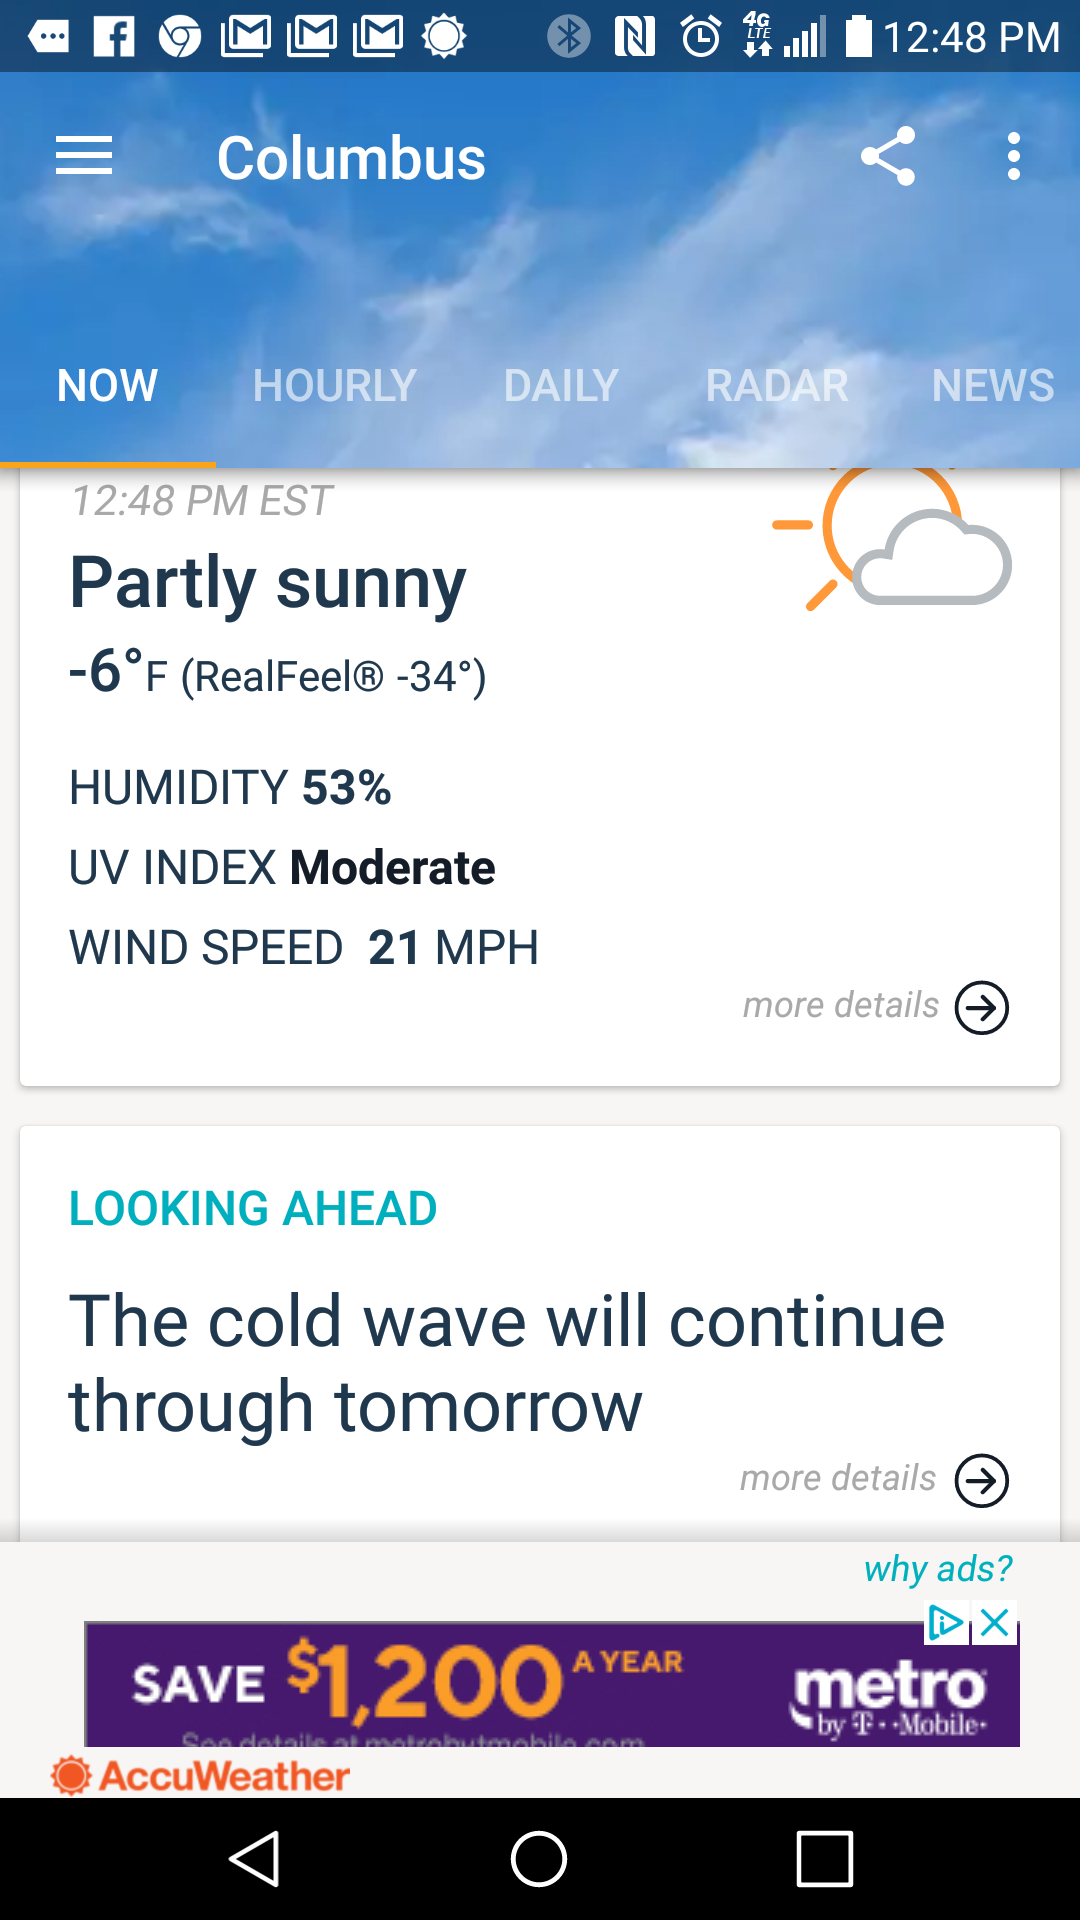 Screenshot_2019-01-30-12-48-31.png